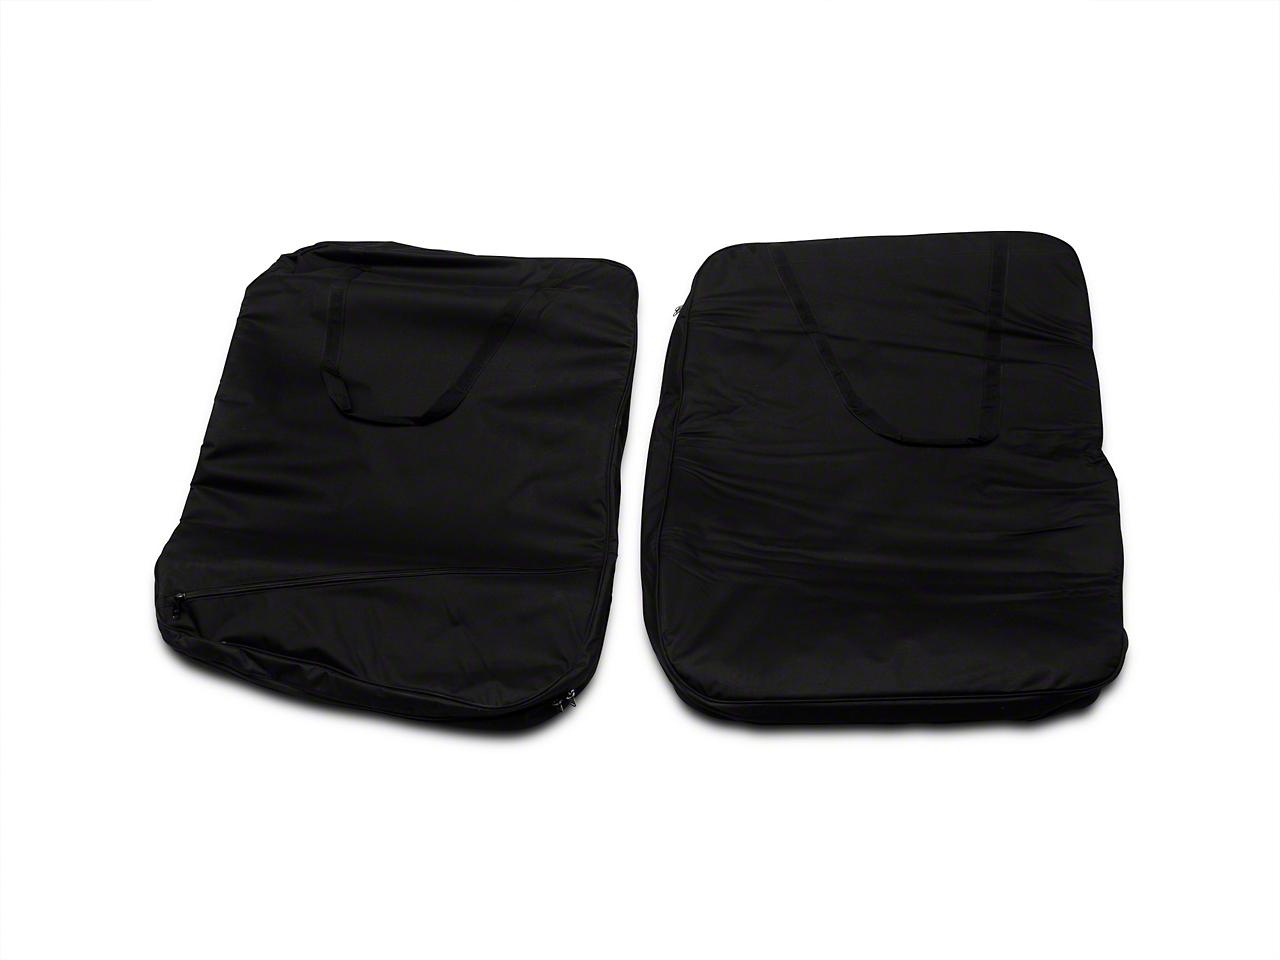 Smittybilt Storage Bag - Hard Doors - Pair - Black (07-15 Wrangler JK)